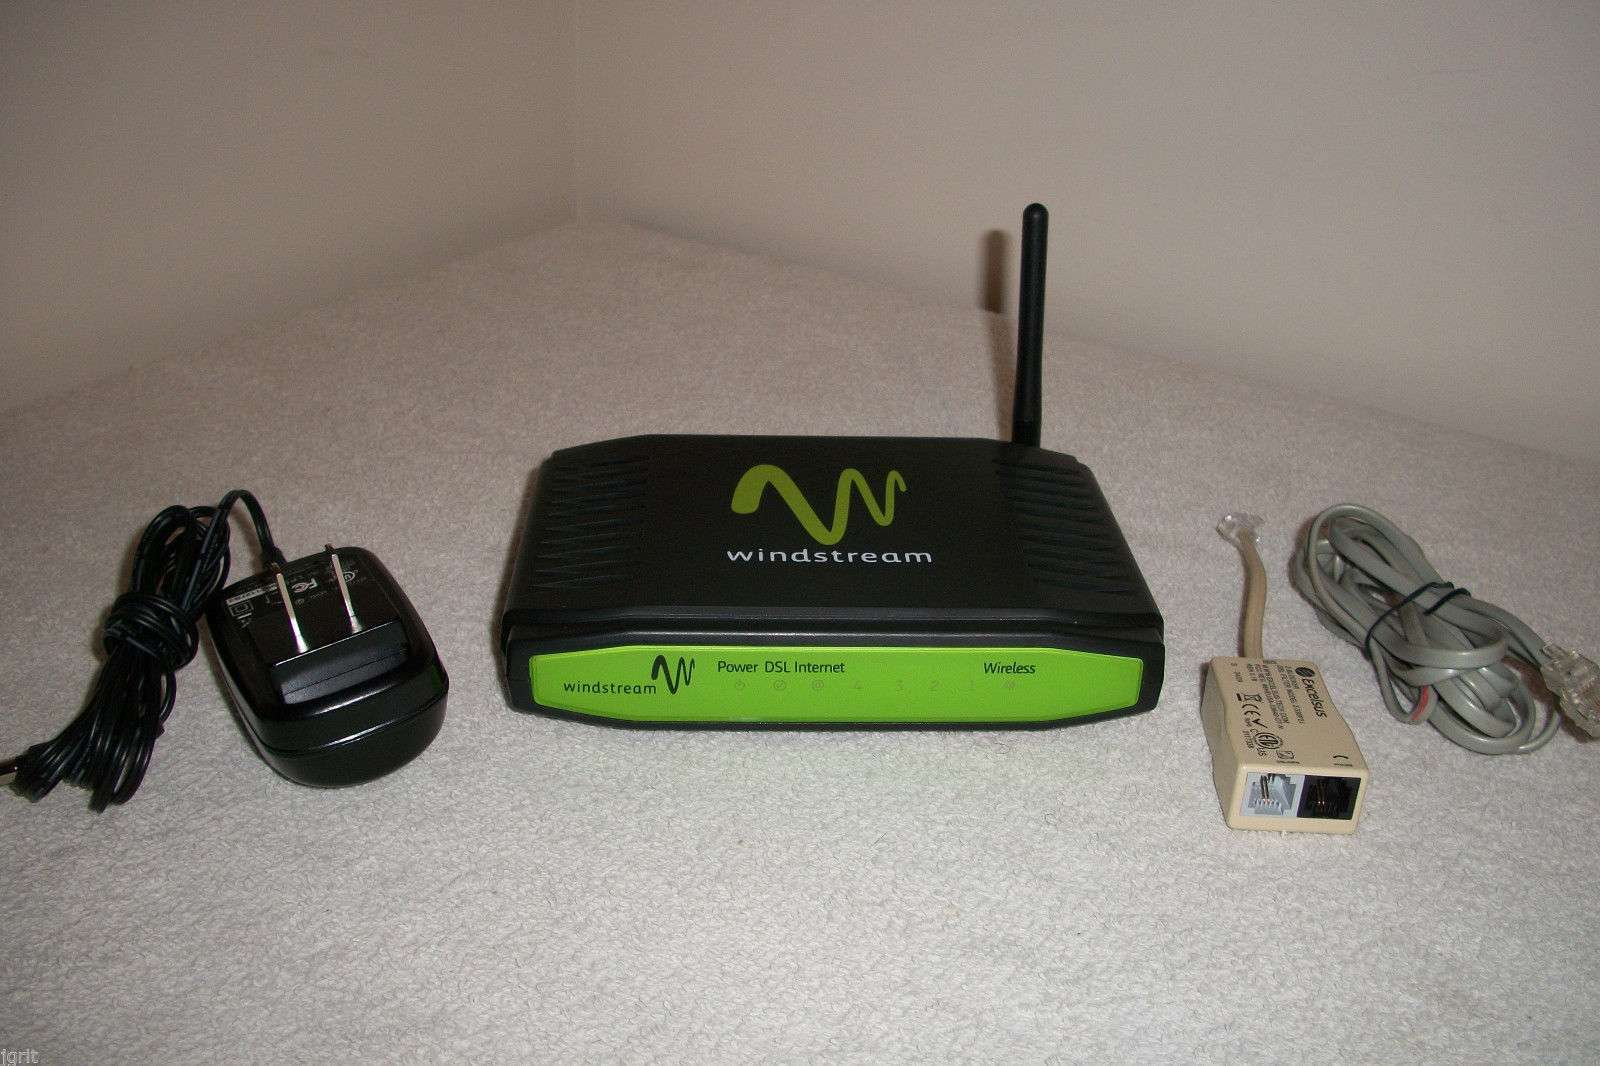 WindStream Sagemcom MODEM 1704 WIRELESS 4 port internet ROUTER DSL ethernet  WPS